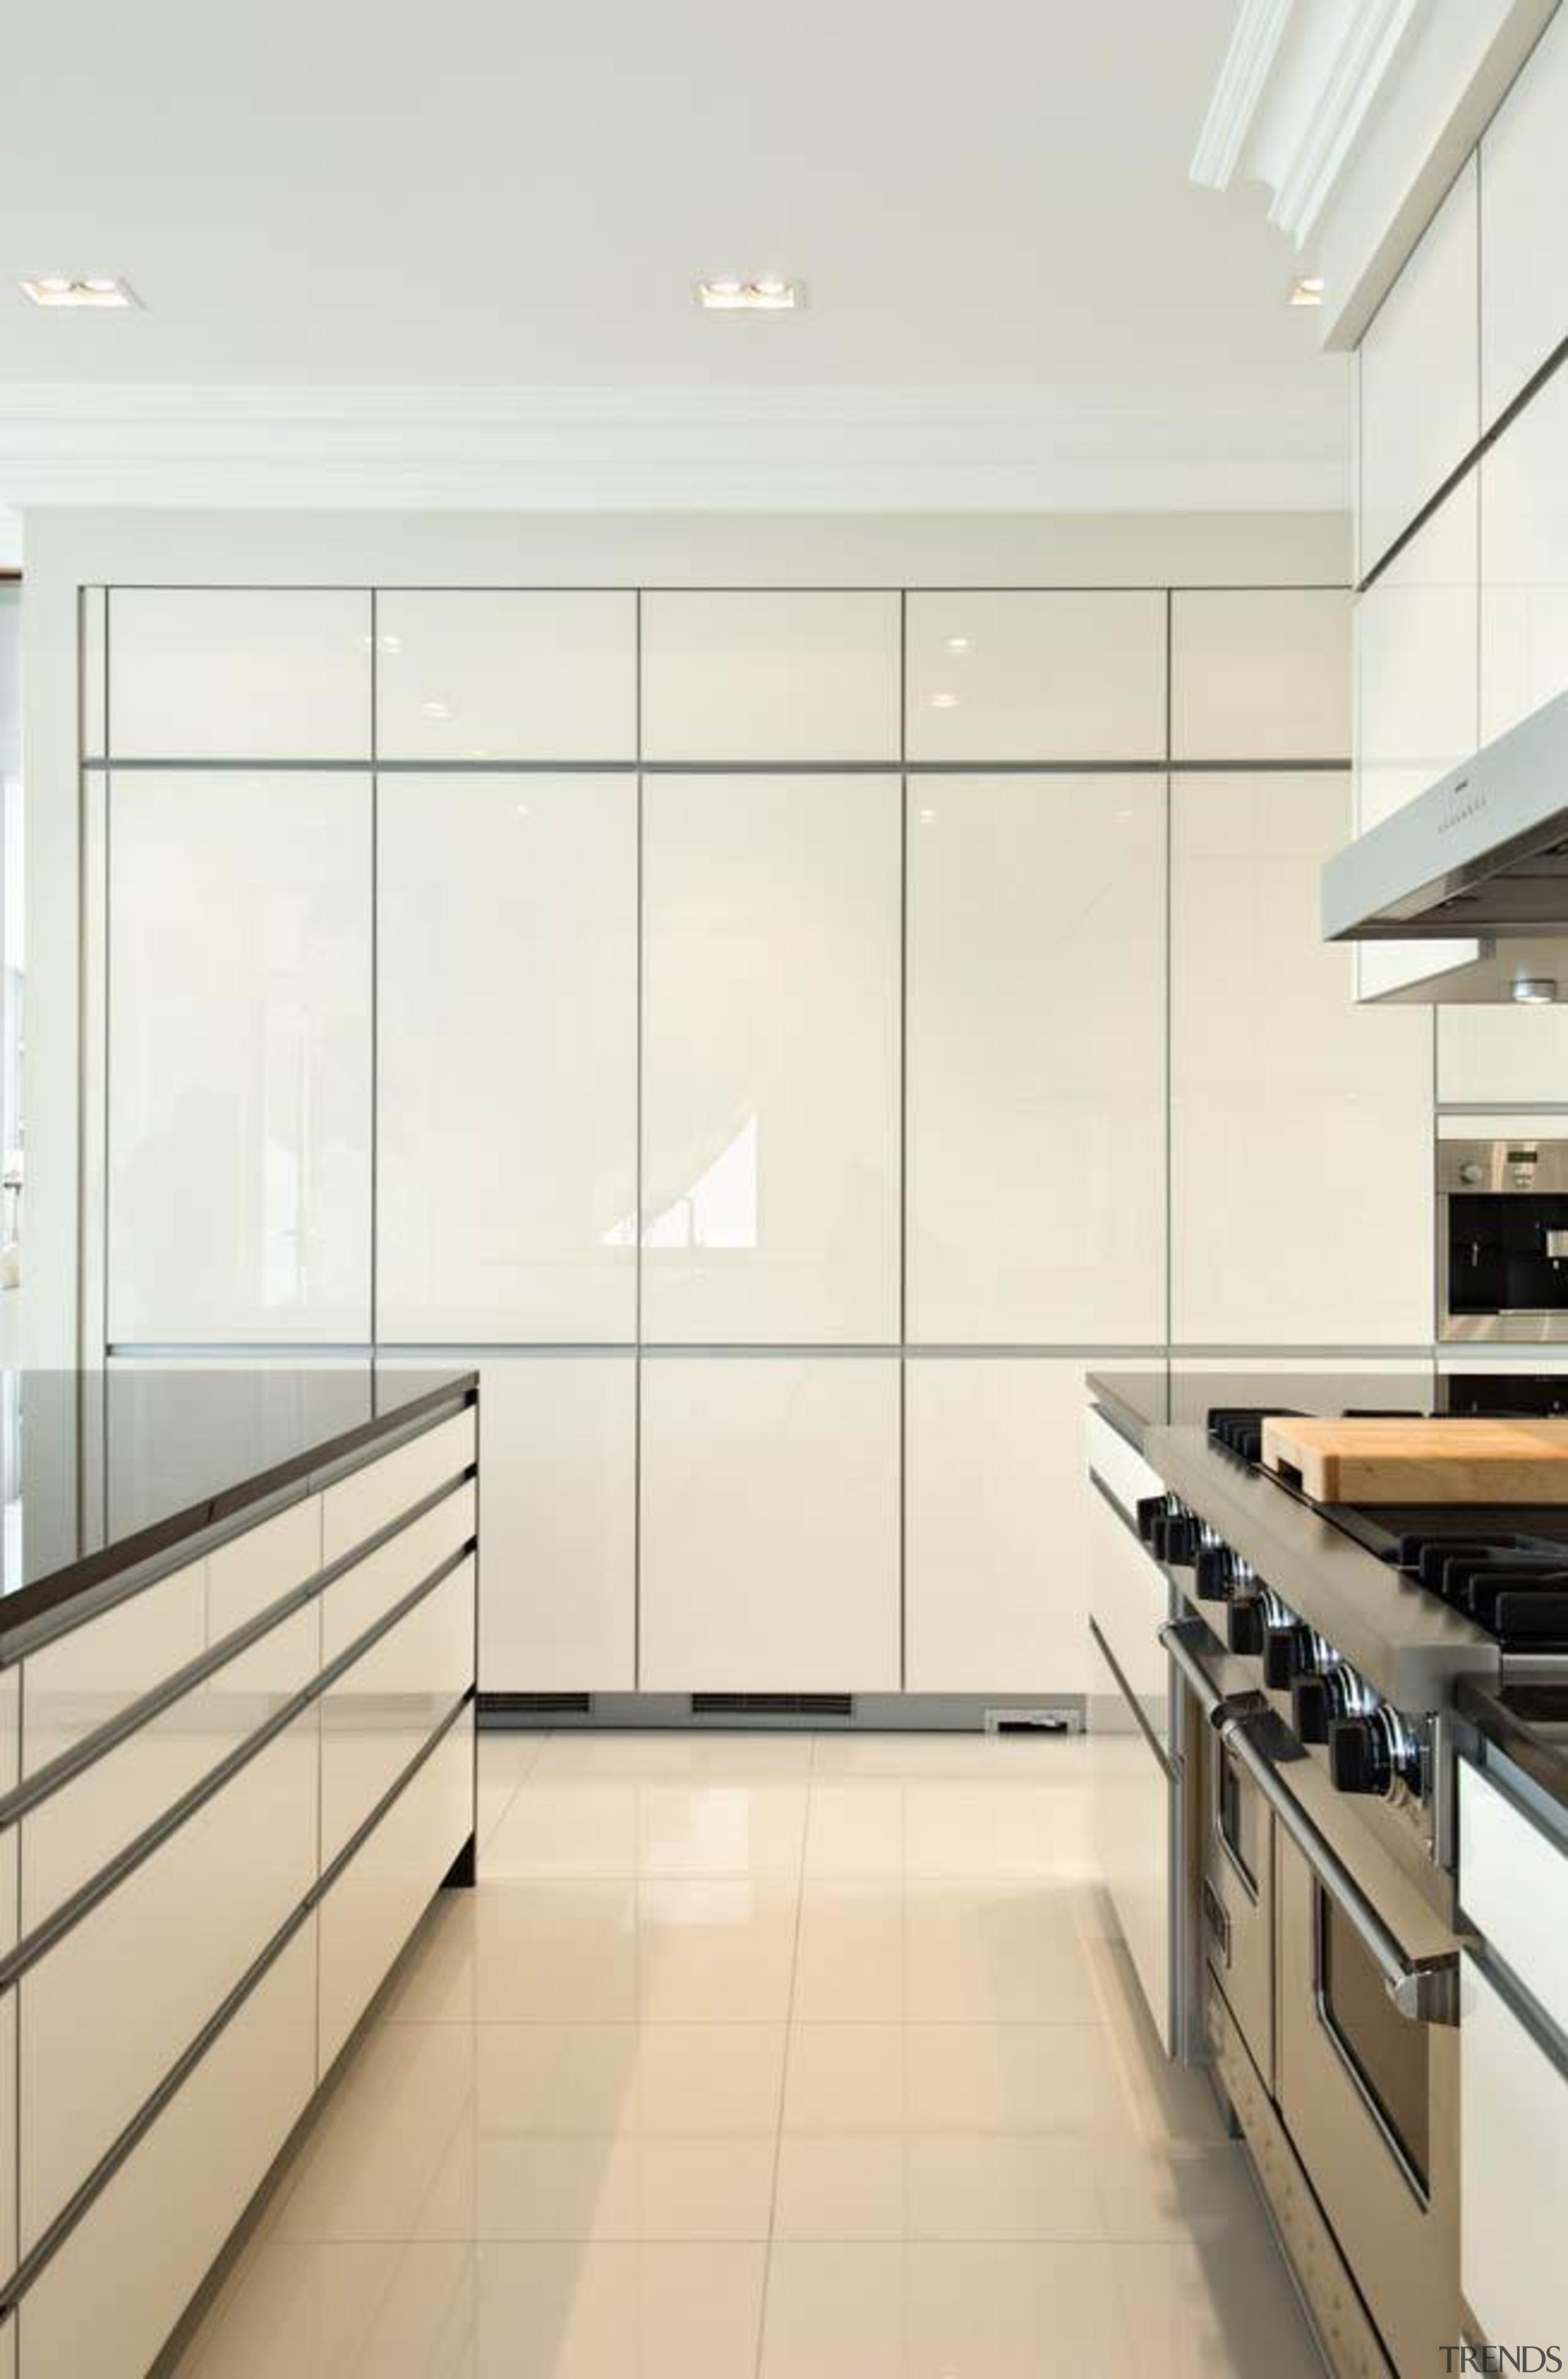 Wellington Kitchen of the Year 2010 - Wellington cabinetry, countertop, floor, flooring, interior design, kitchen, room, tile, white, orange